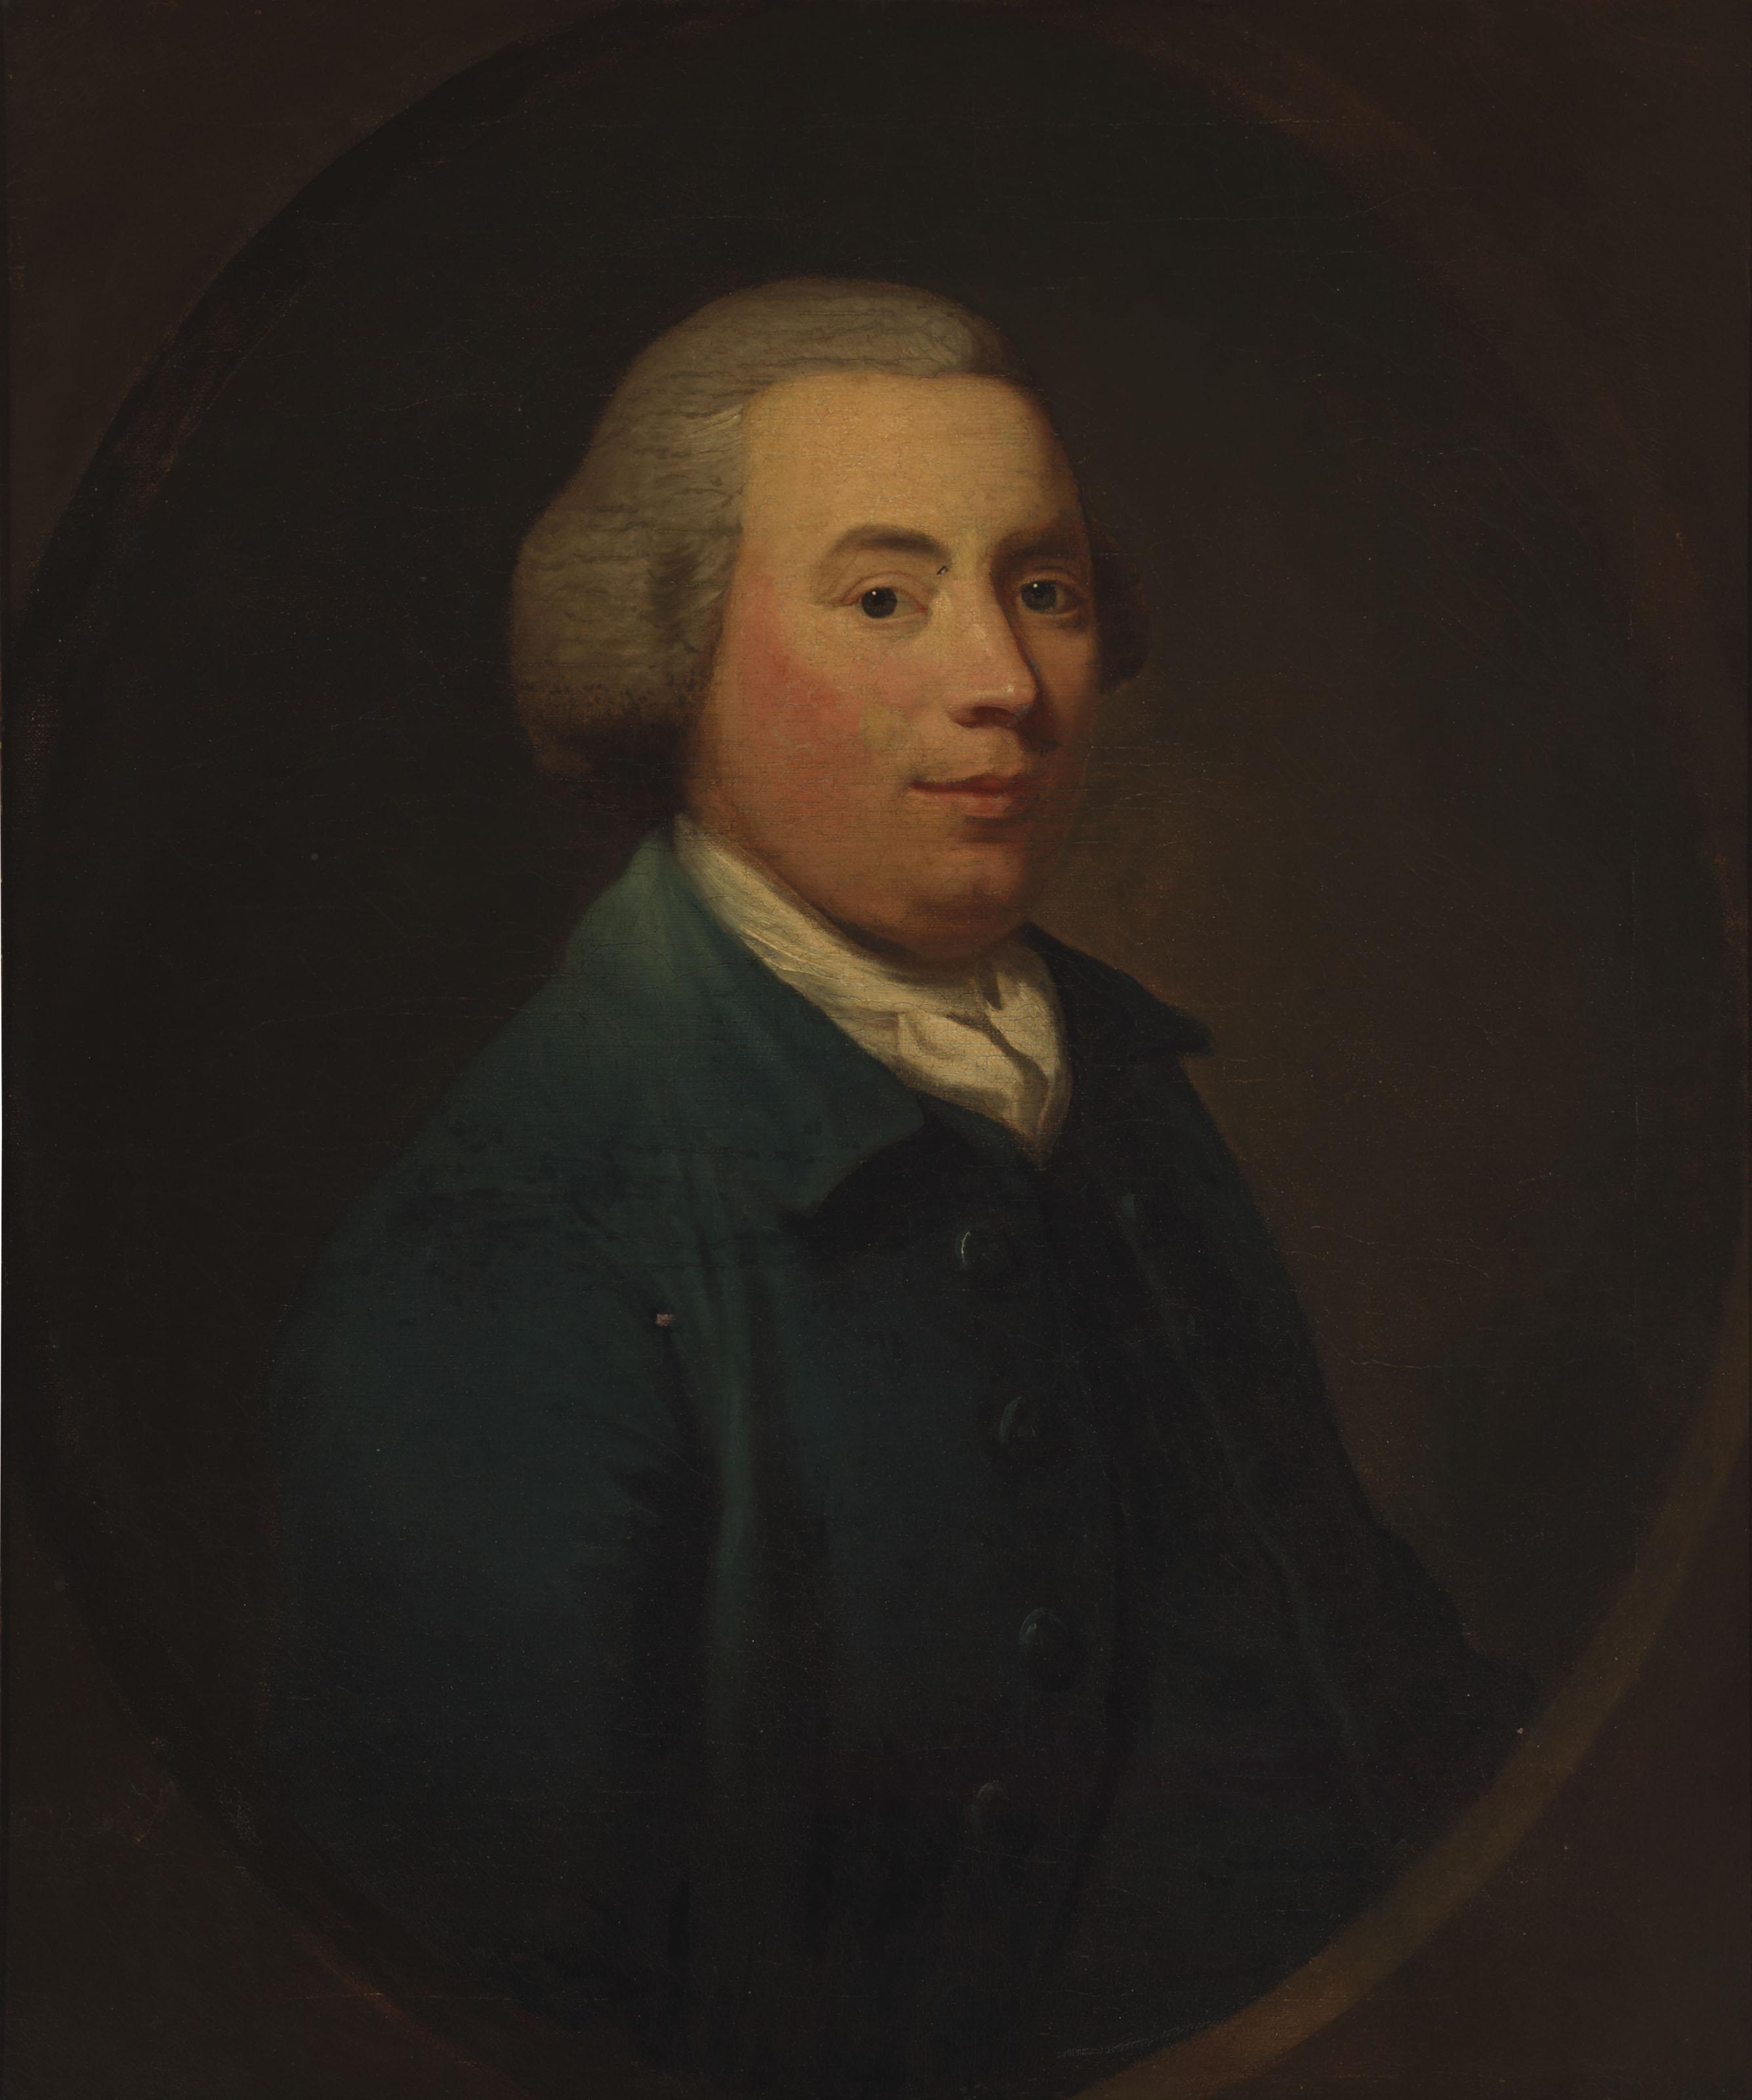 Portrait of a Gentleman, possibly John Adams